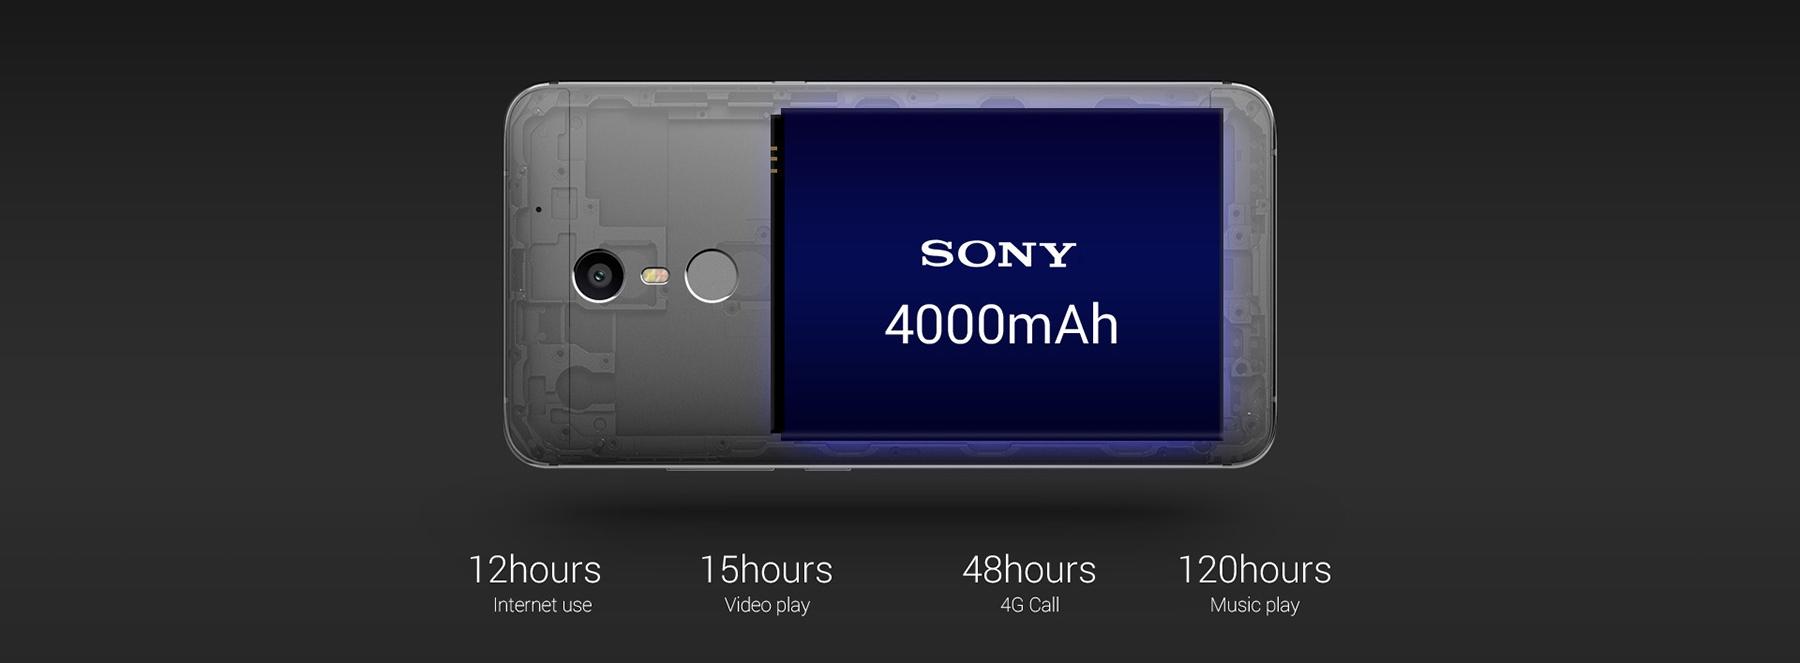 Аккумулятор: несъемный 4000 mAh, 4.35V, производства Sony